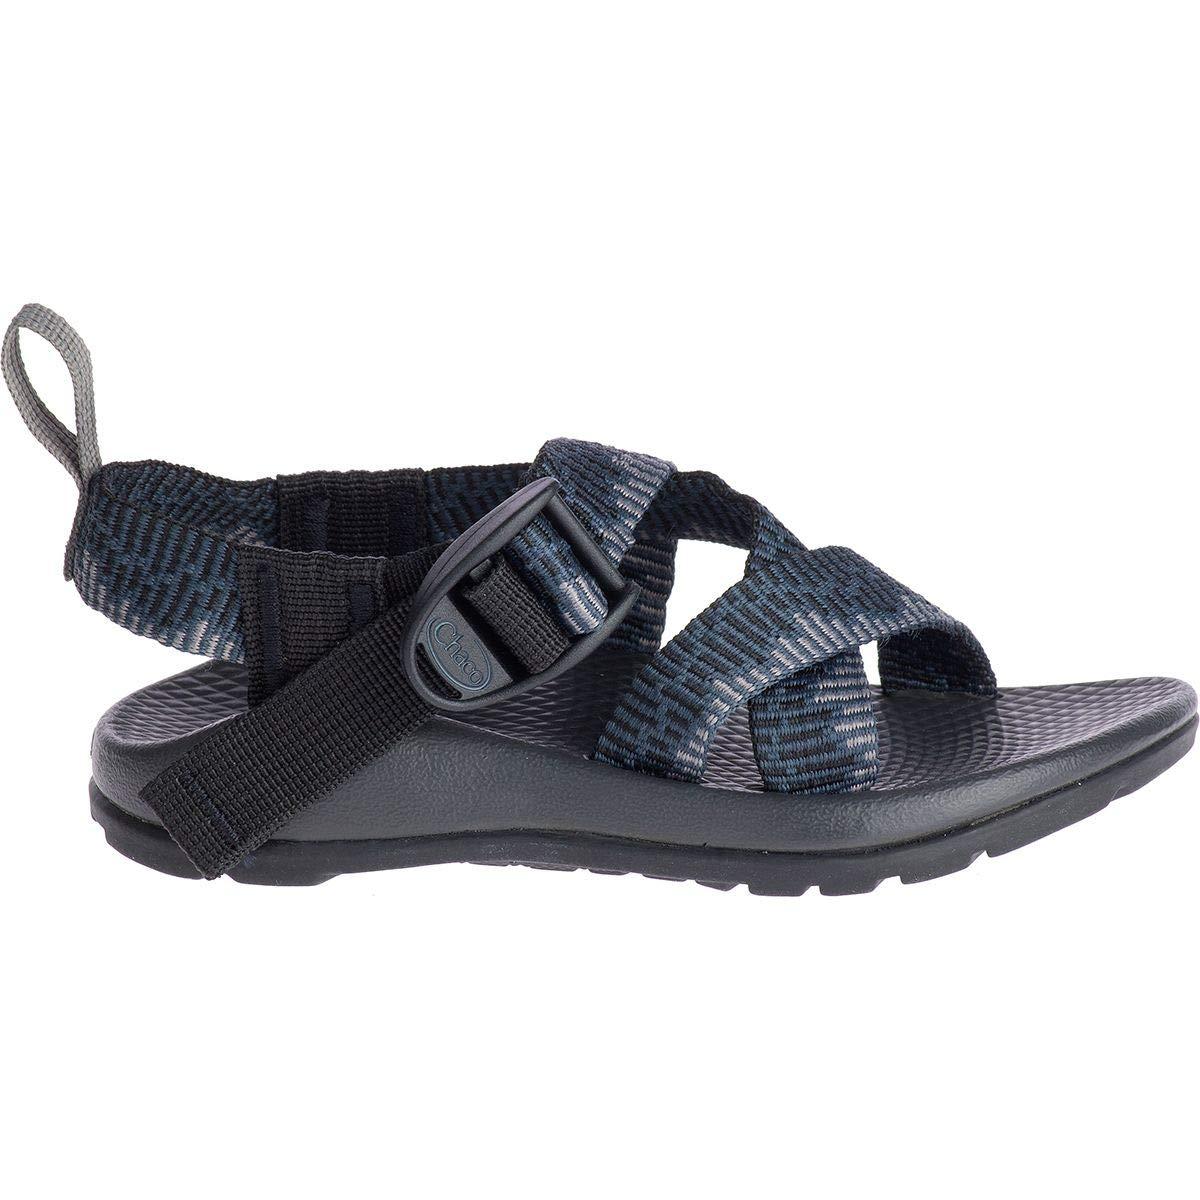 Little Kid//Big Kid Chaco Z1 Ecotread Sandal